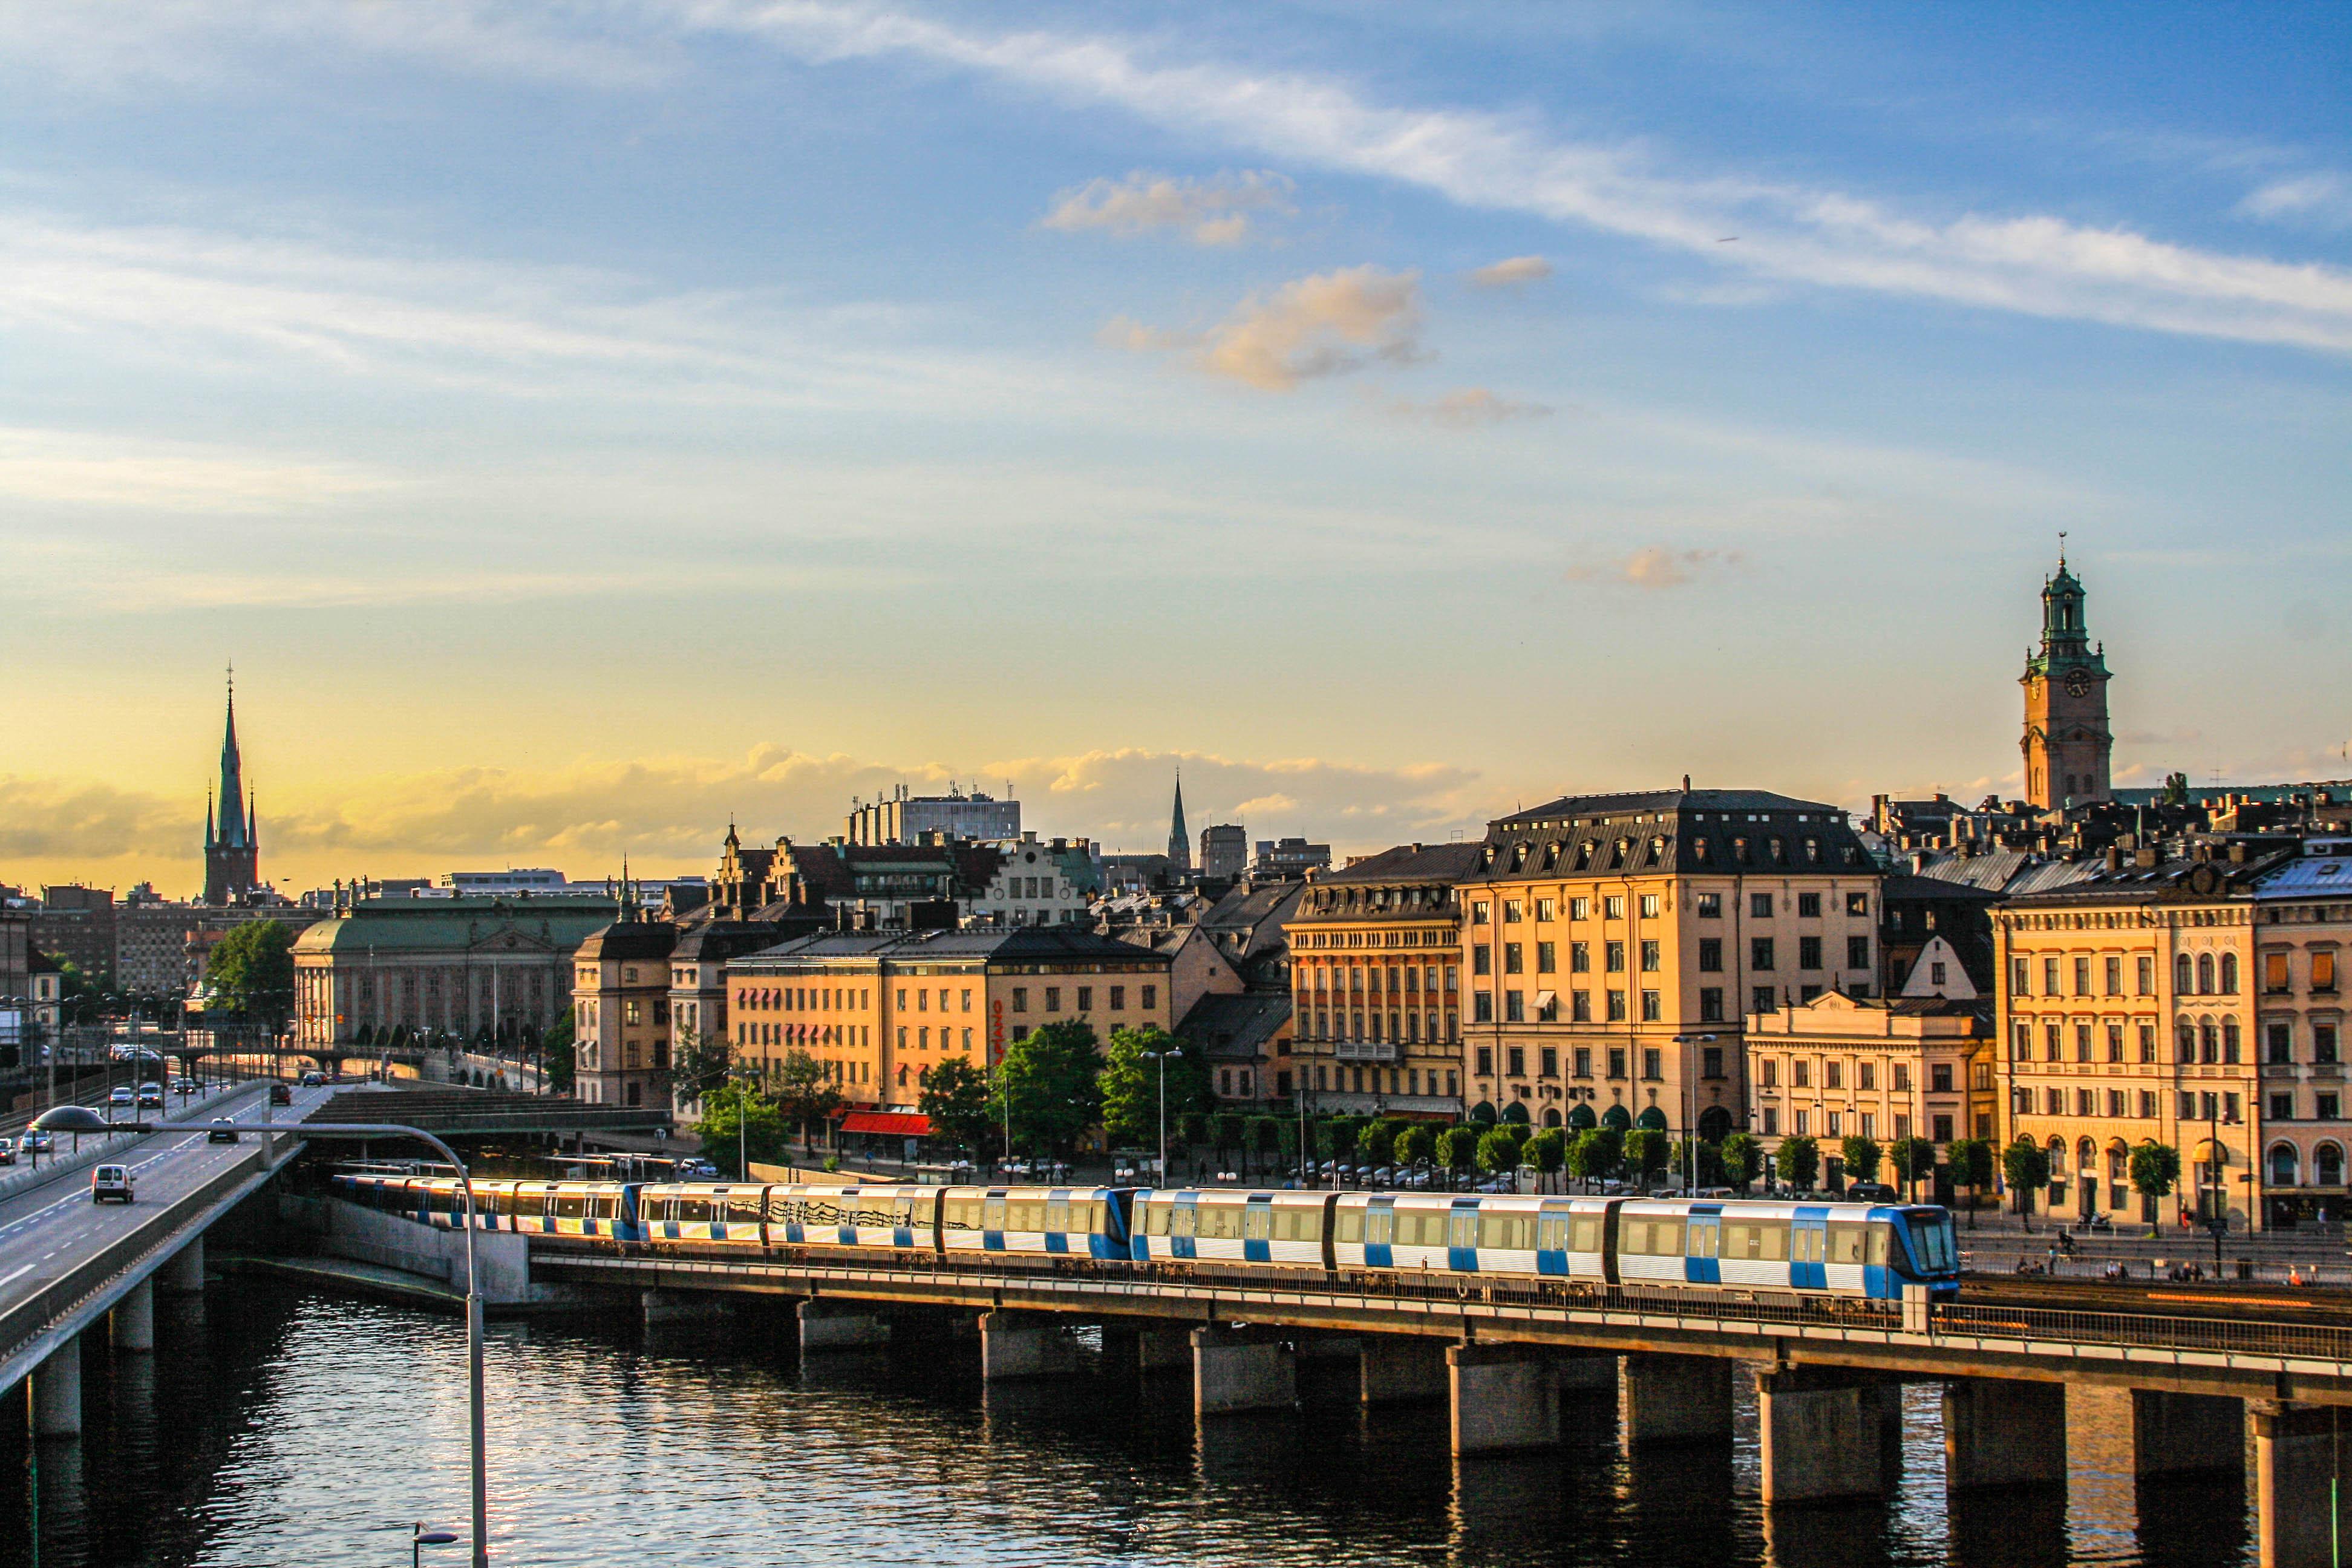 stockholm 4 tage mit hotel fl gen und fr hst ck f r nur 156. Black Bedroom Furniture Sets. Home Design Ideas